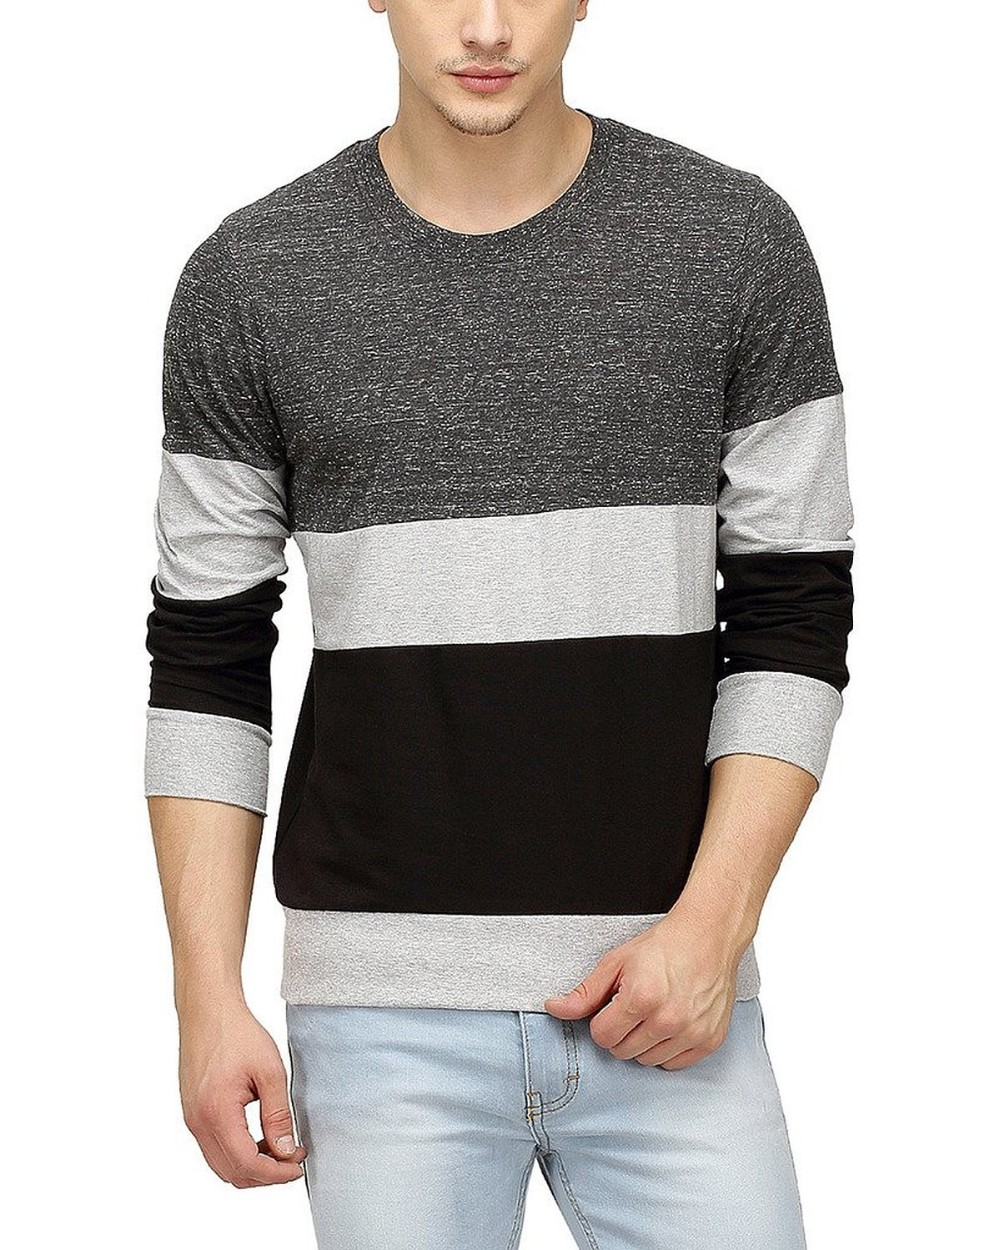 57ba54462 Clothing manufacturers overseas men tri colour full sleeve custom t-shirt  online shopping pakistan